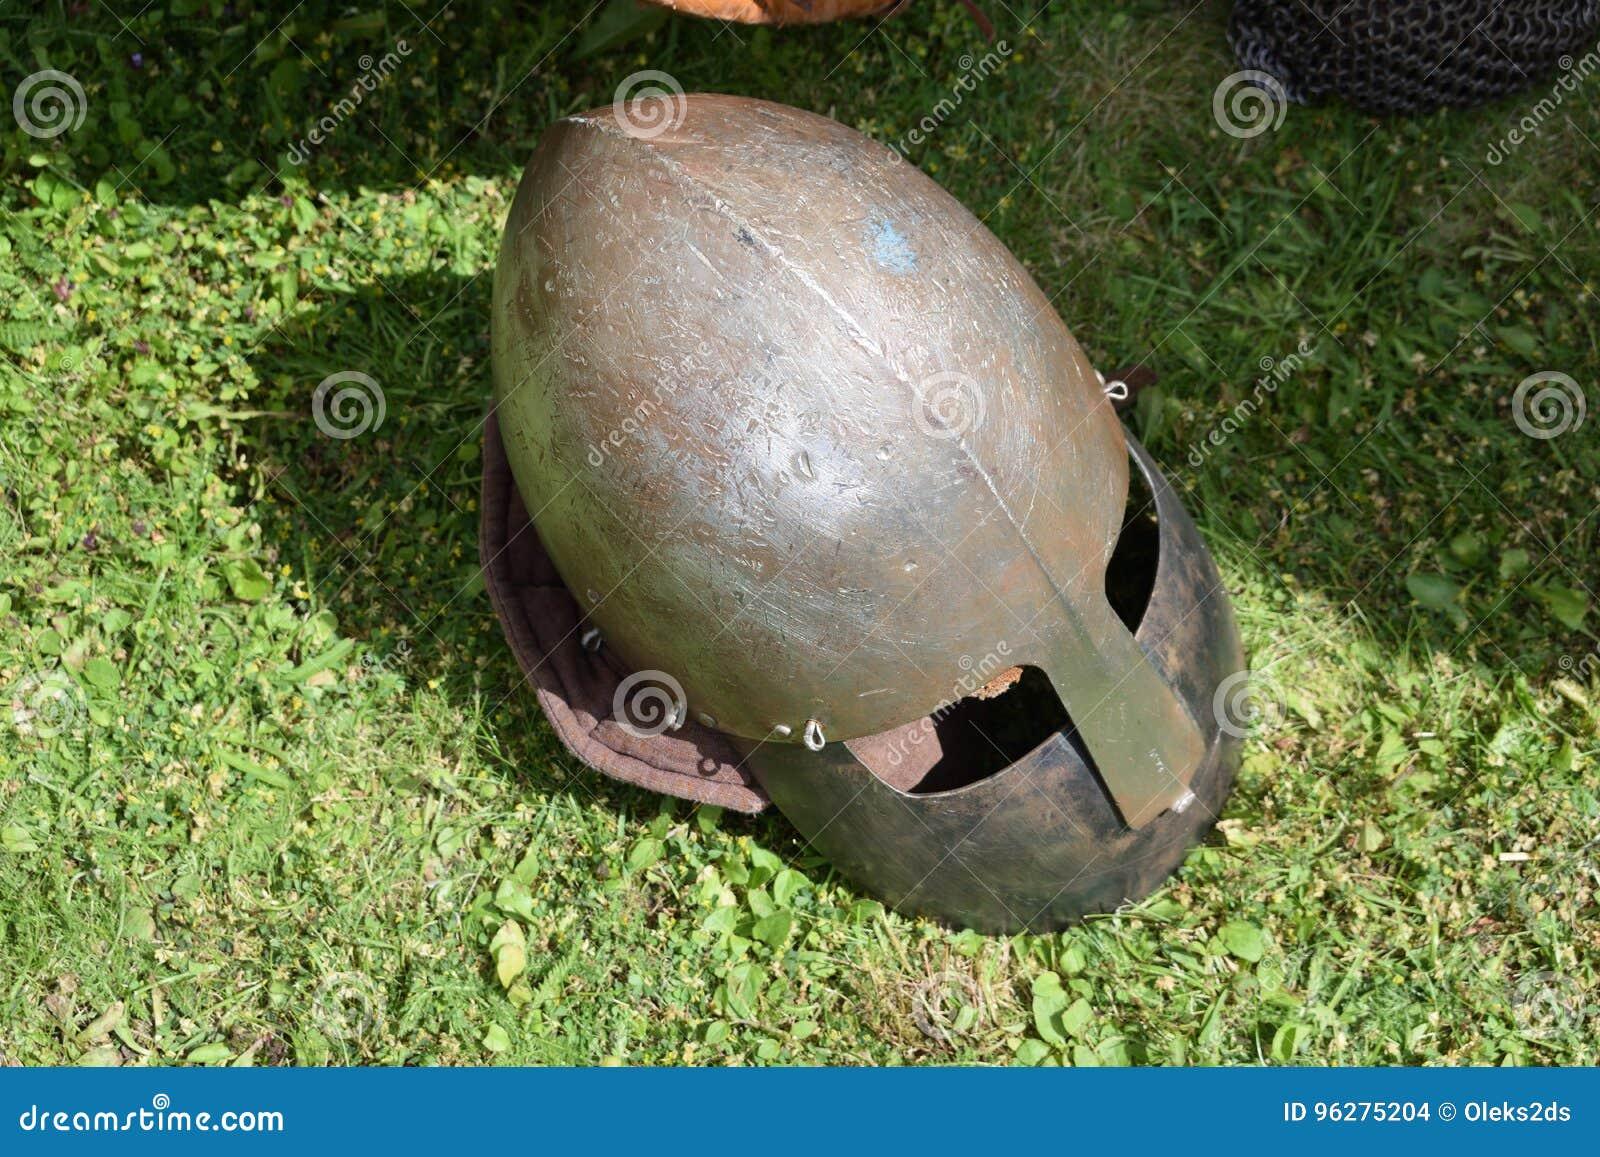 medieval knight s helmet with face guard visor closeup stock photo